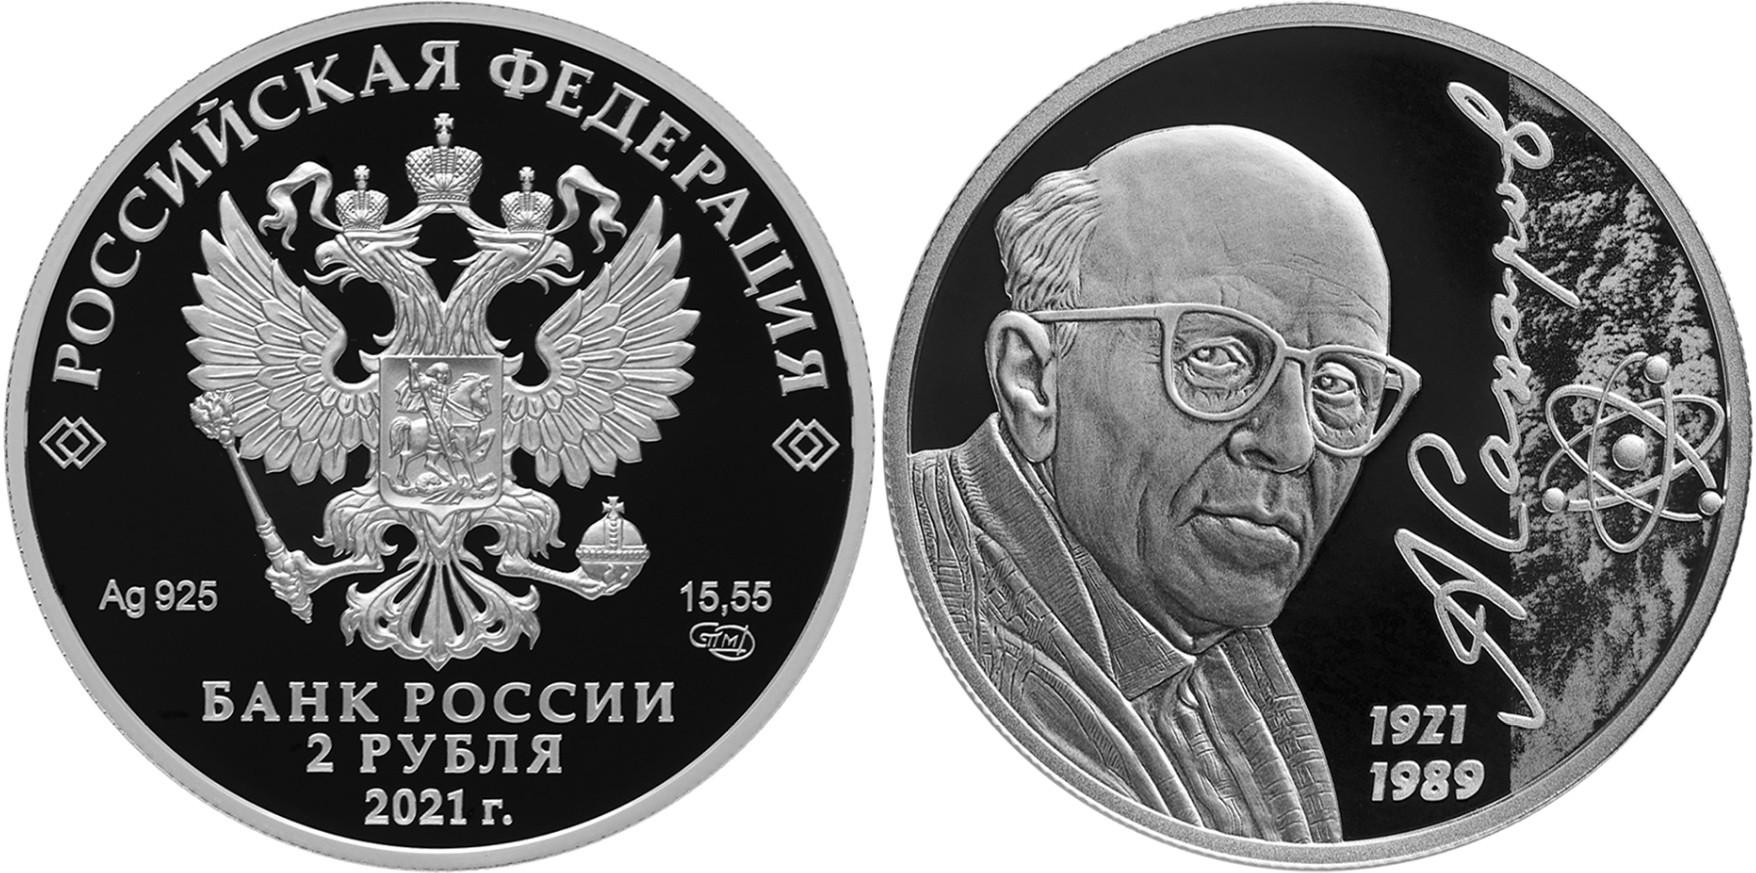 russie-2021-andrey-sakharov